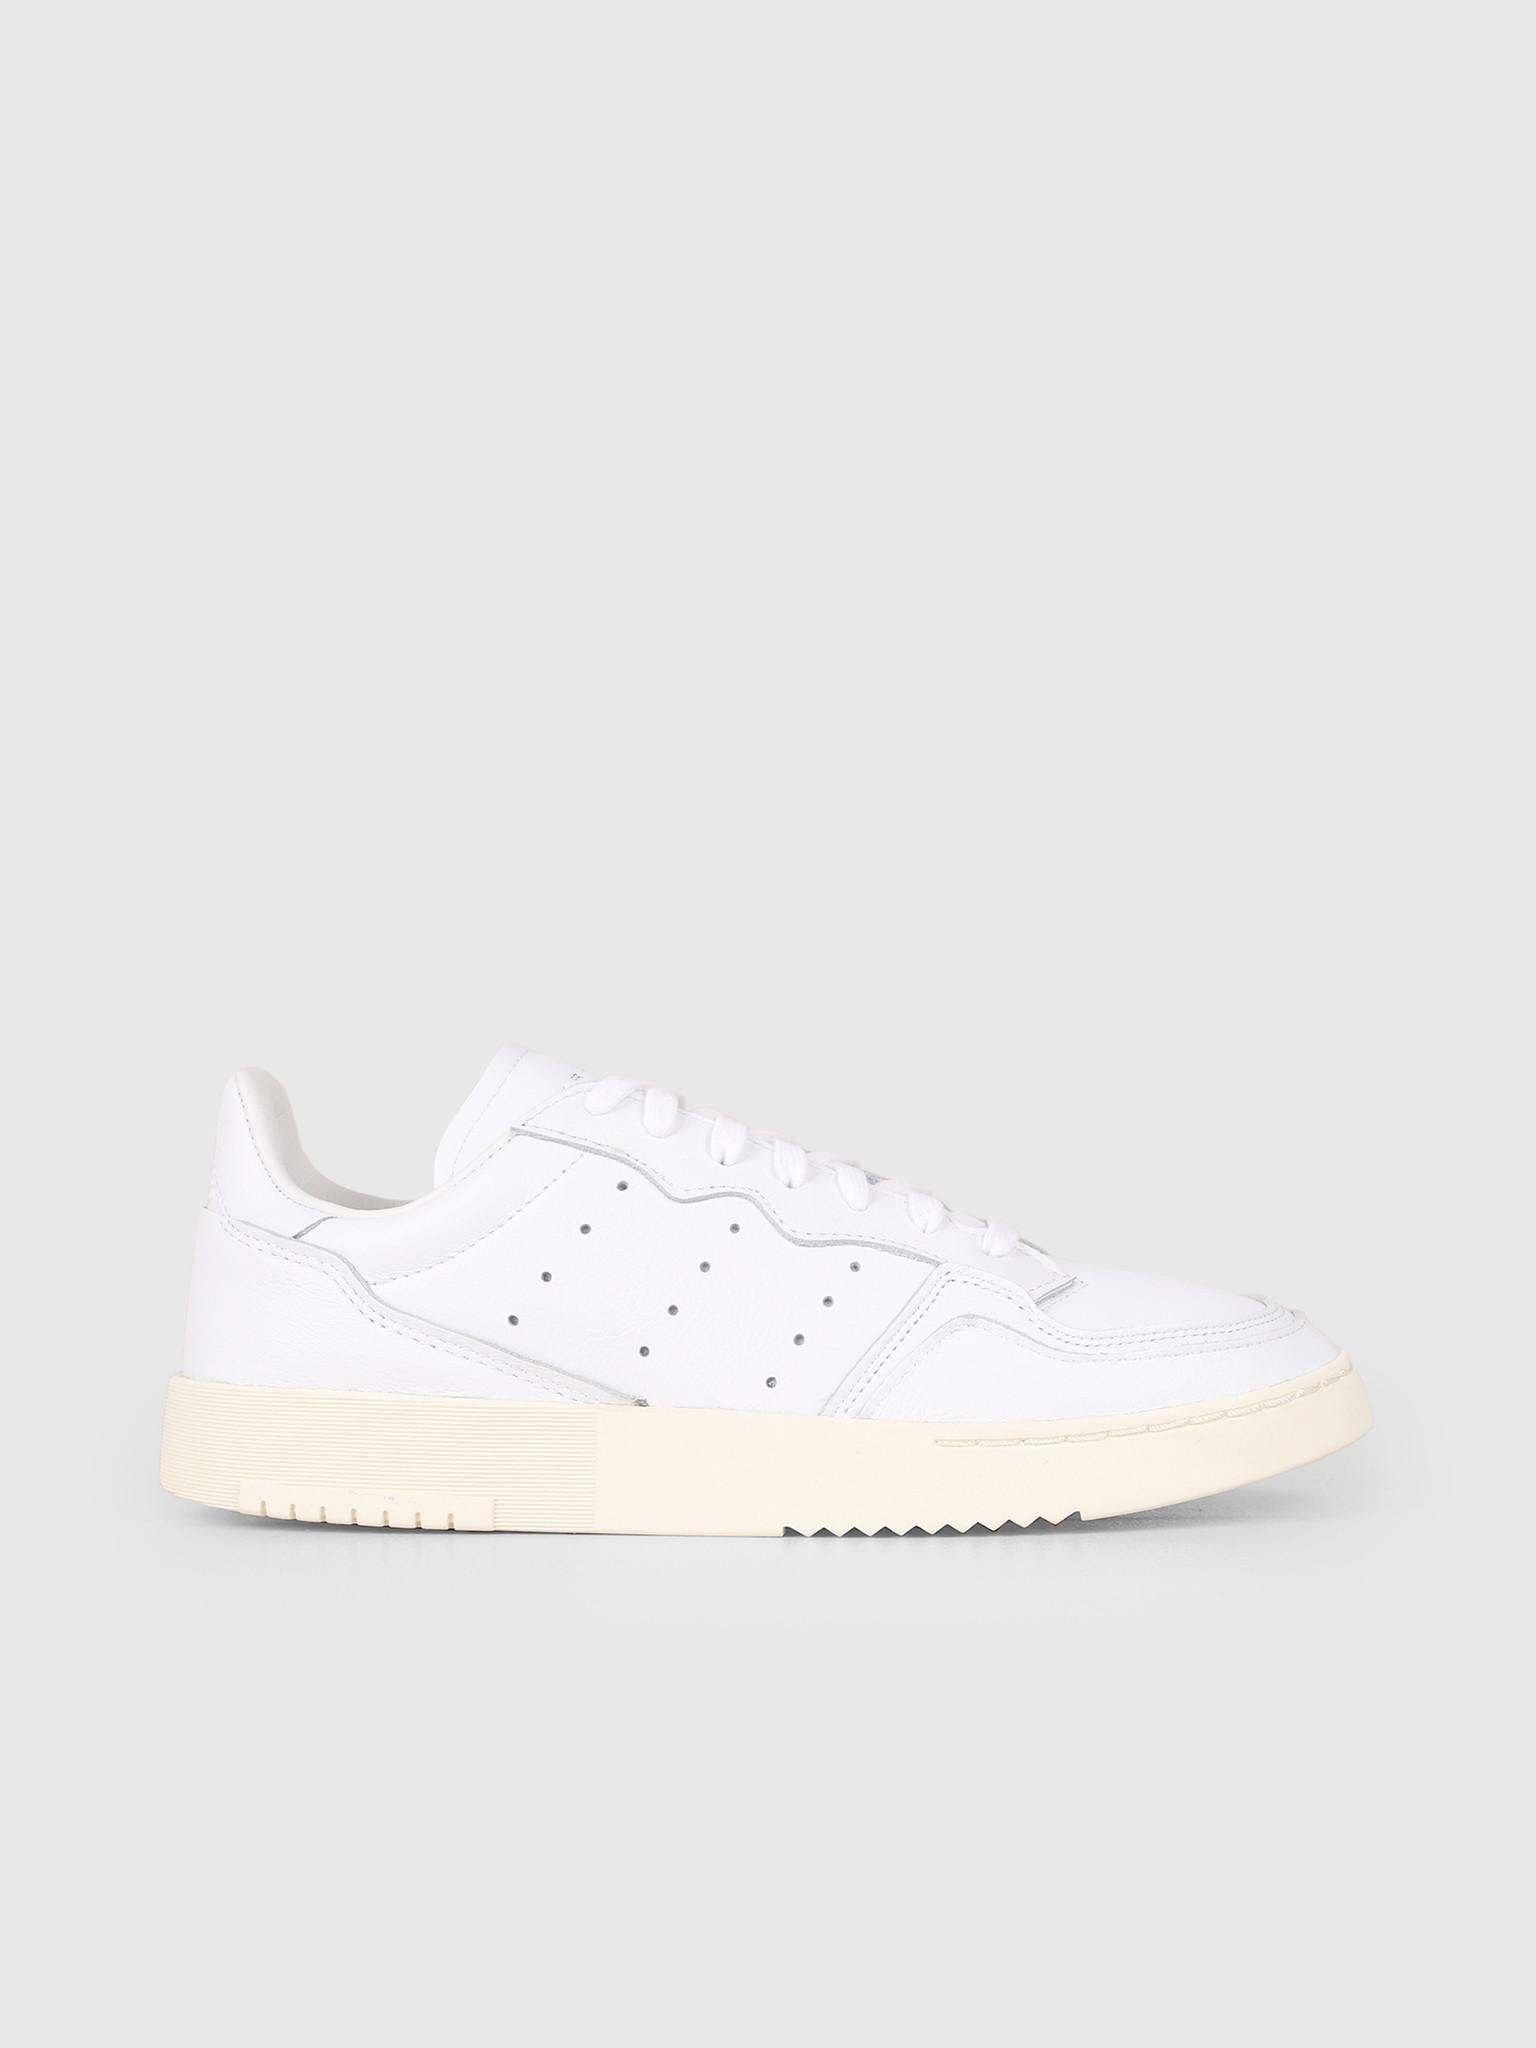 adidas adidas Supercourt Cry White White EE6325